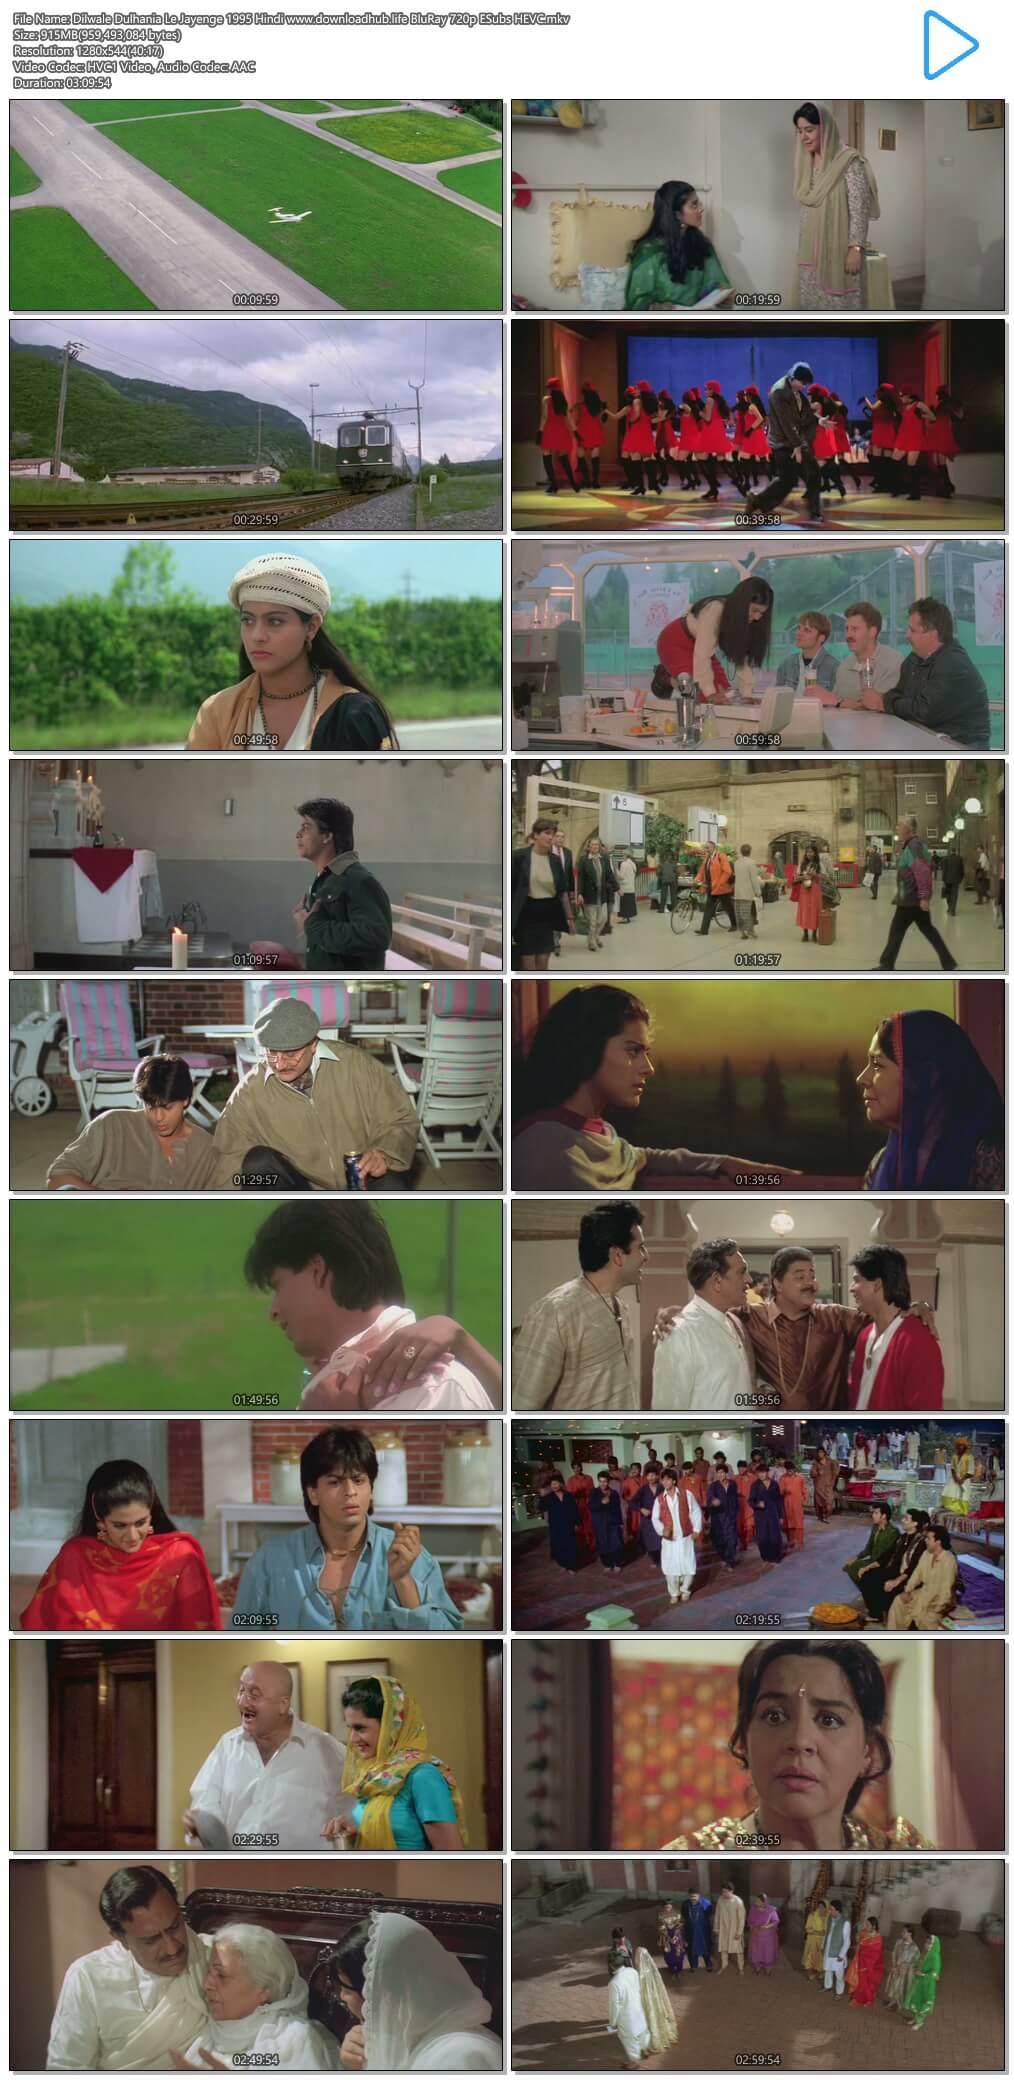 Dilwale Dulhania Le Jayenge 1995 Hindi 900MB BluRay 720p ESubs HEVC